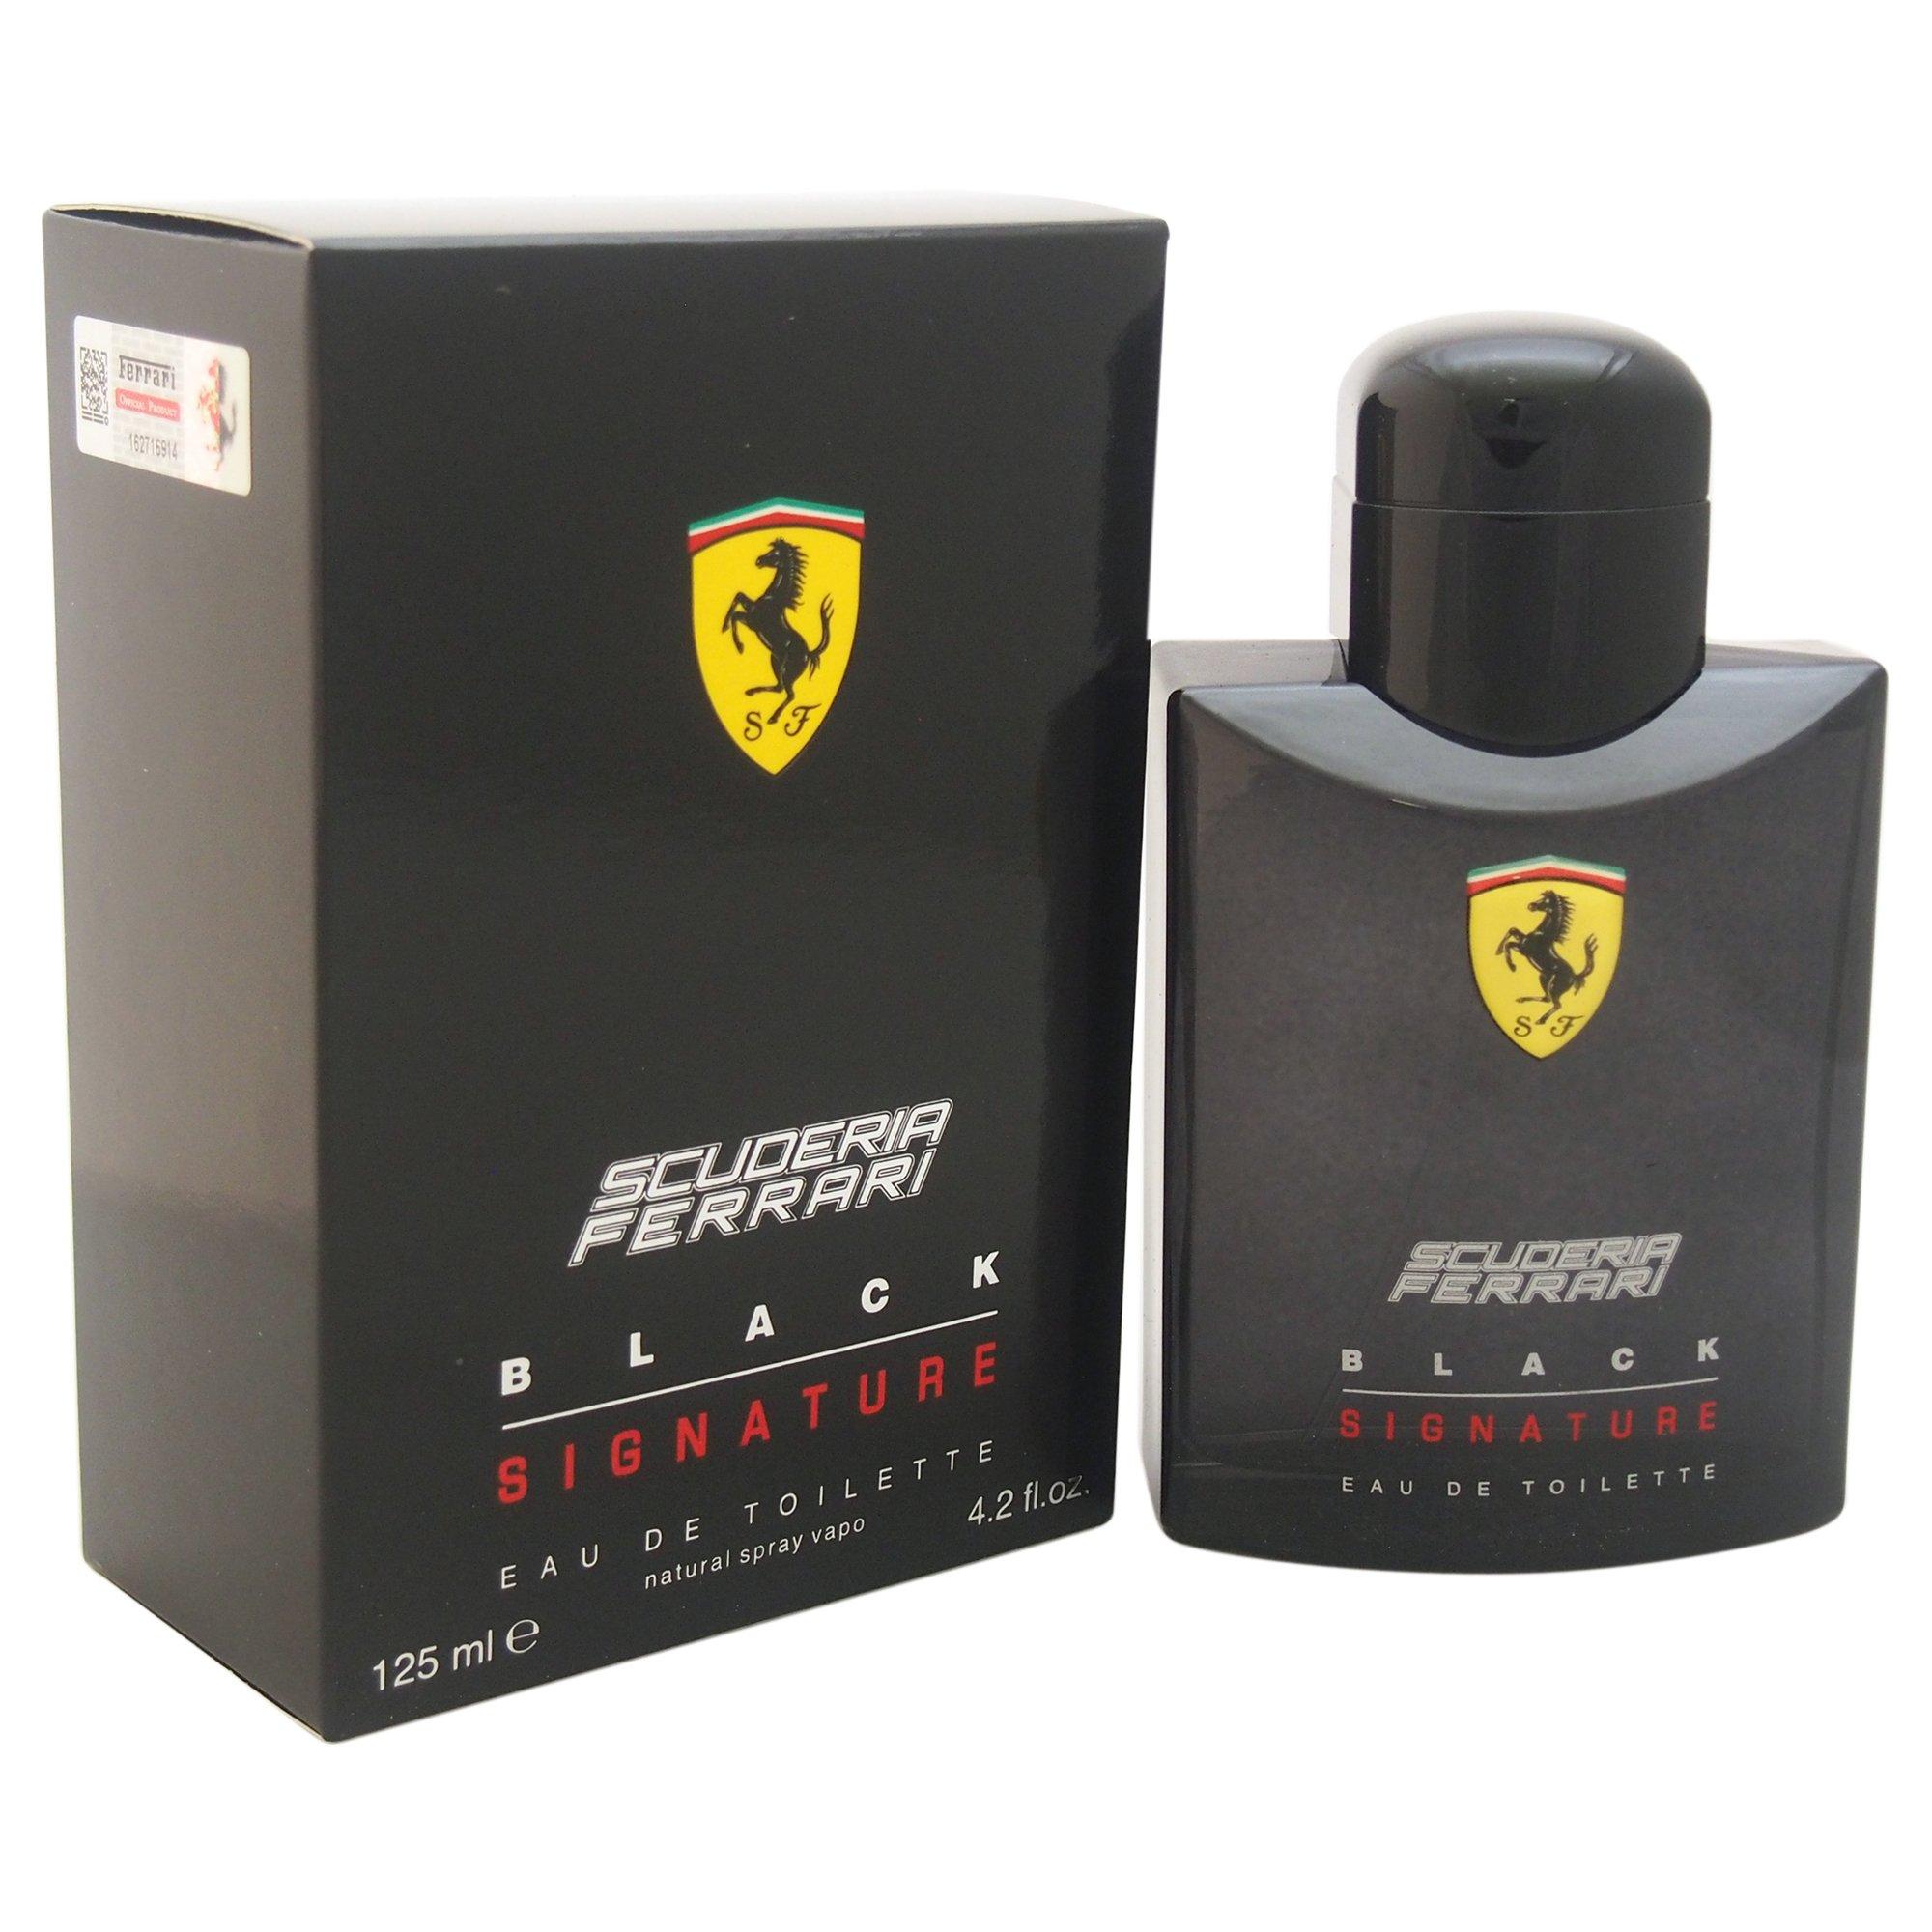 Ferrari Scuderia Black Signature Toilette